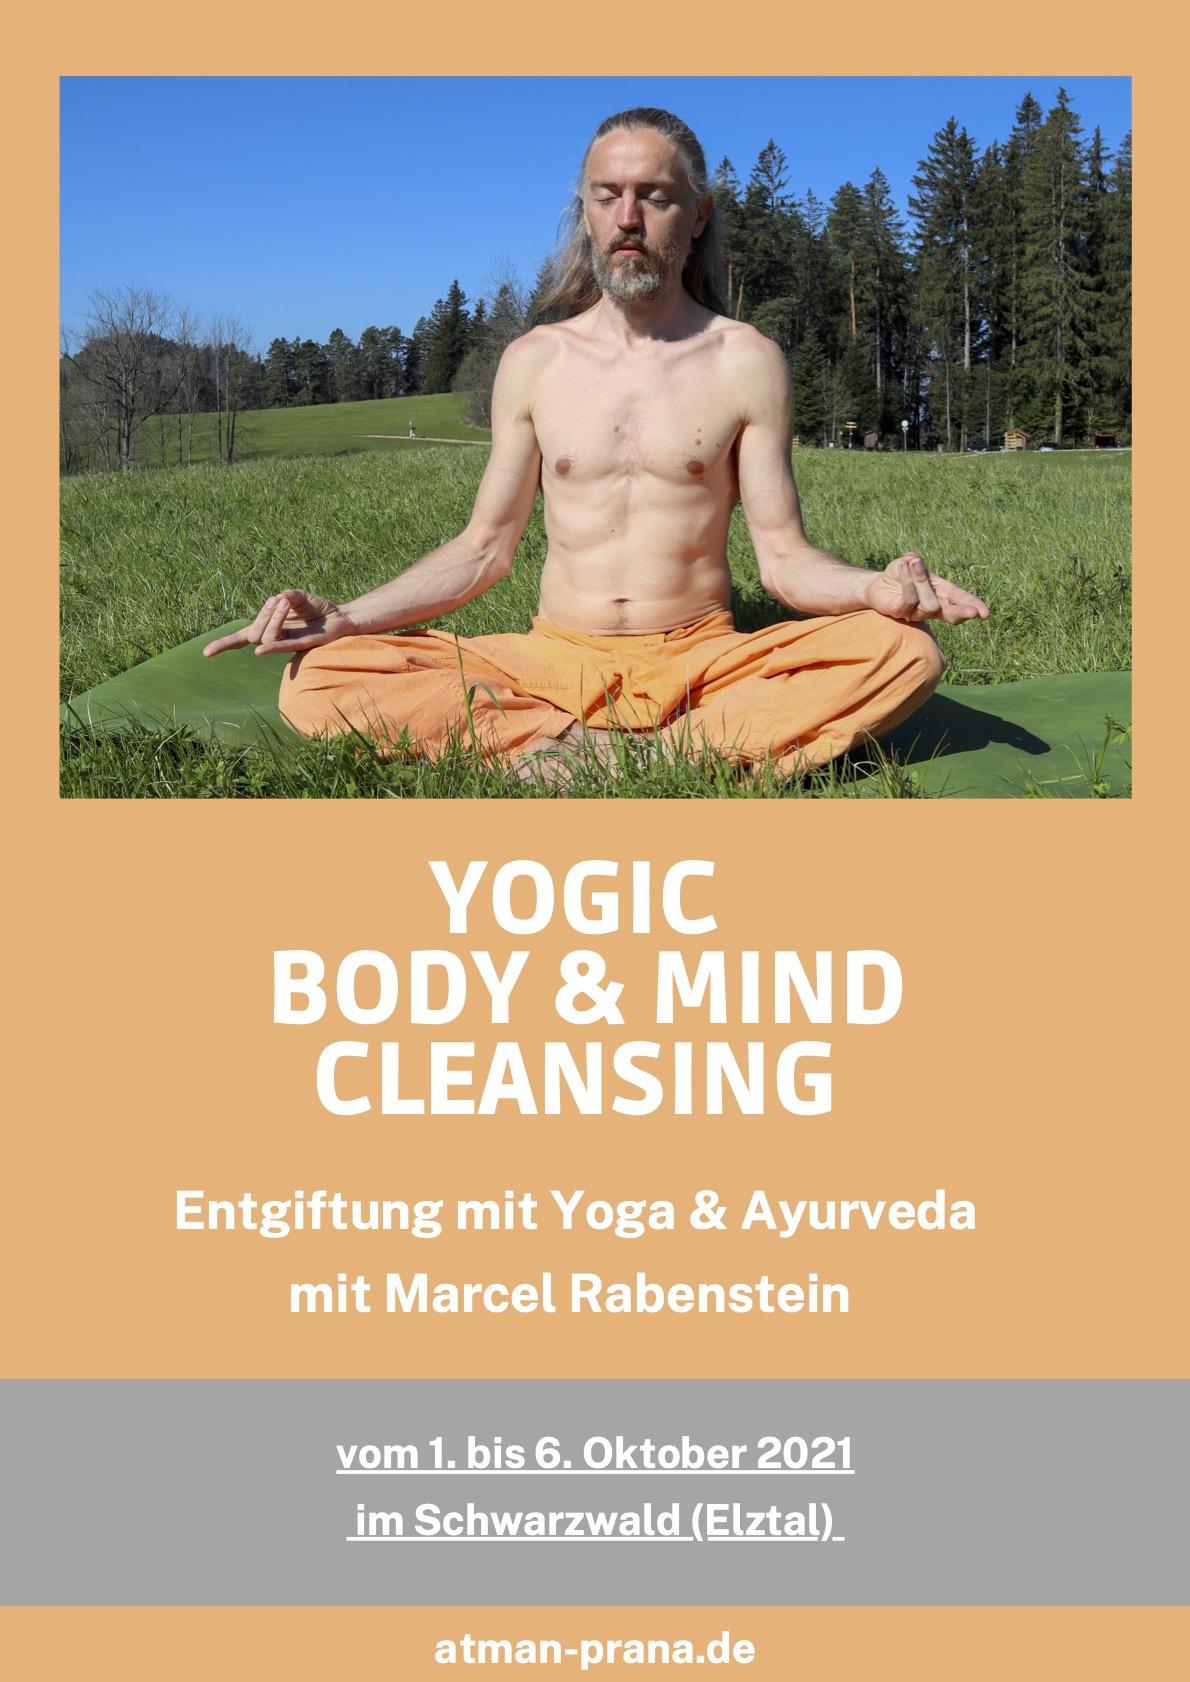 Yoga Retreat und Entgiftung im Schwarzwald 1. - 6.10.2021